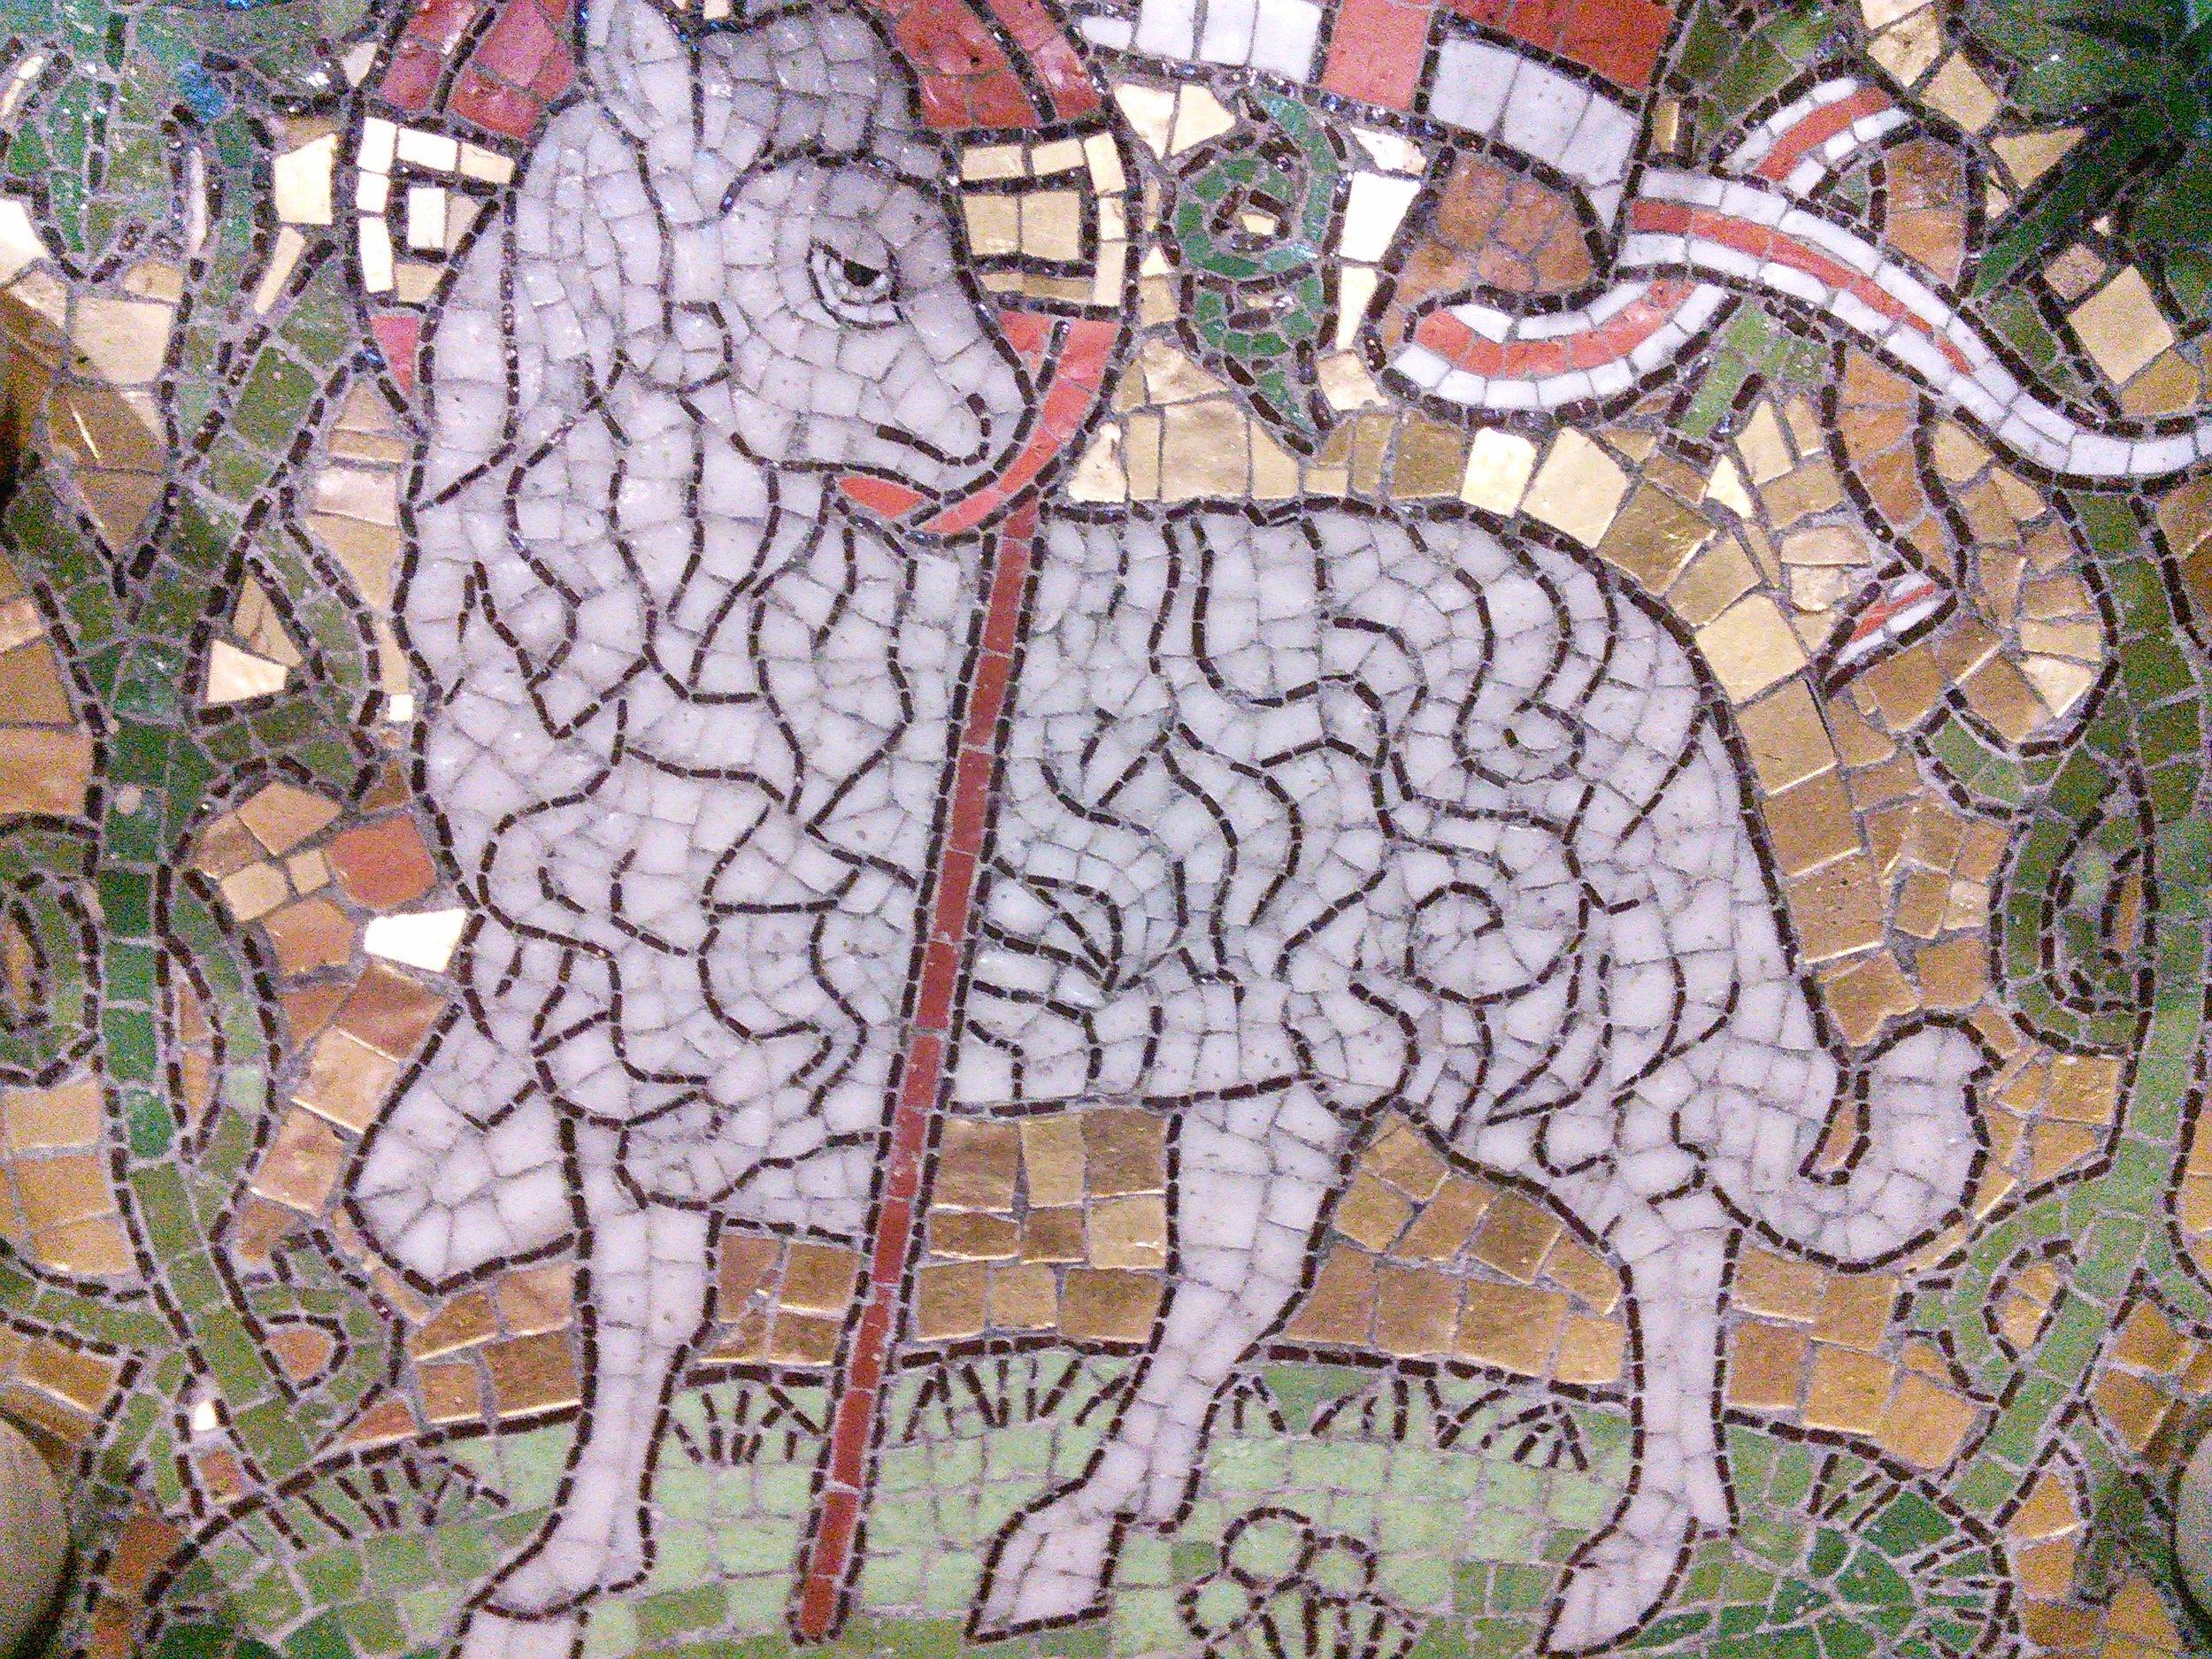 Mosaic of the Lamb of God